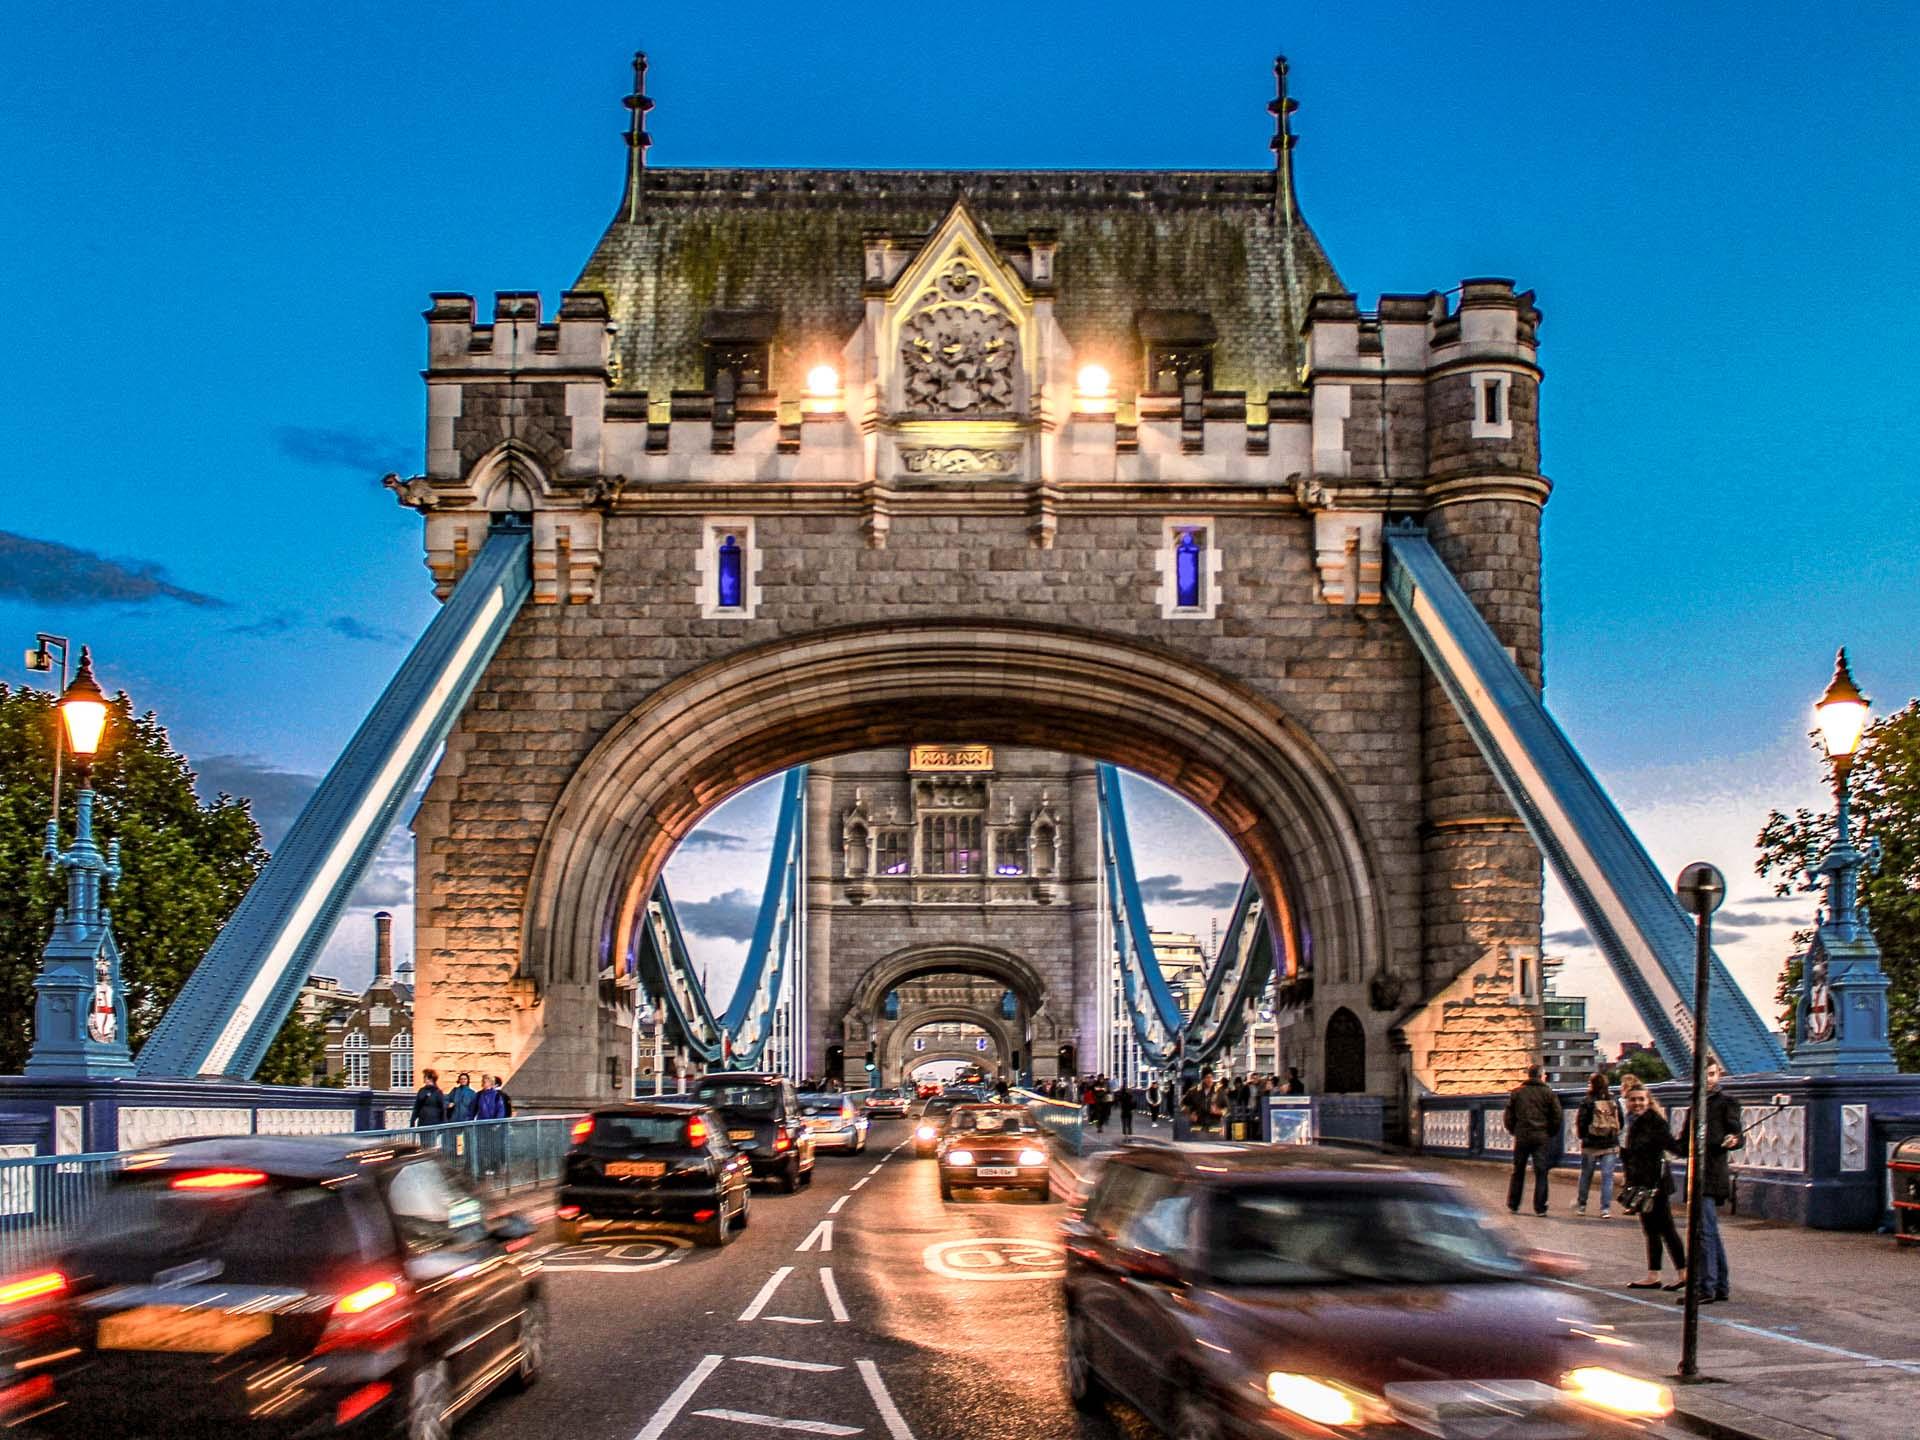 granite worktops costs distance architecture-sky-sunset-bridge-traffic-town-686030